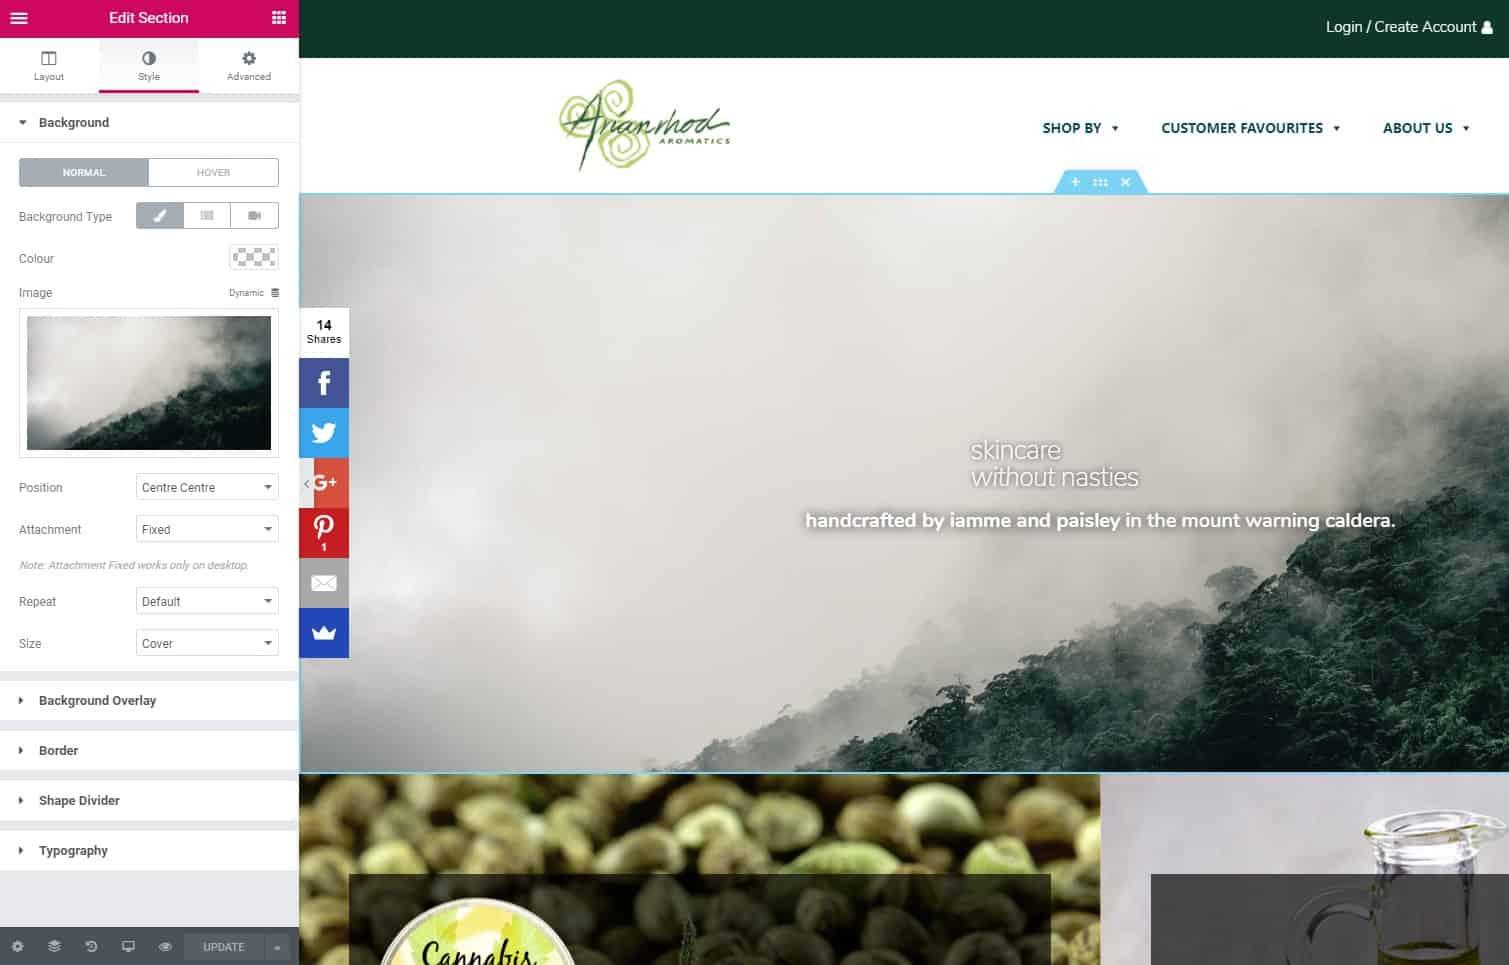 Elementor Screenshot - Arianrhod Aromatics